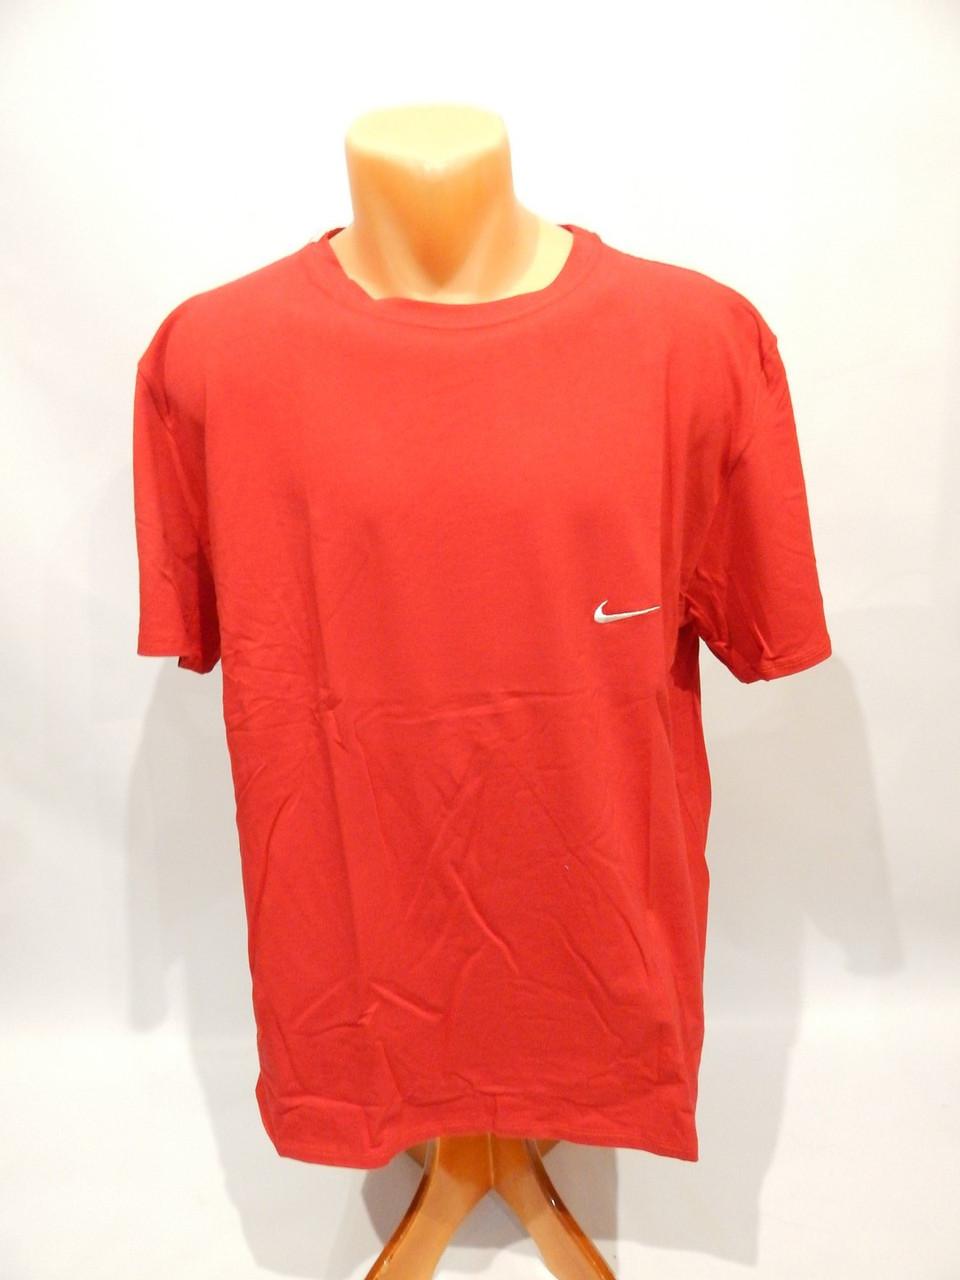 Мужская футболка Nike реплика р.54  008Ф красная